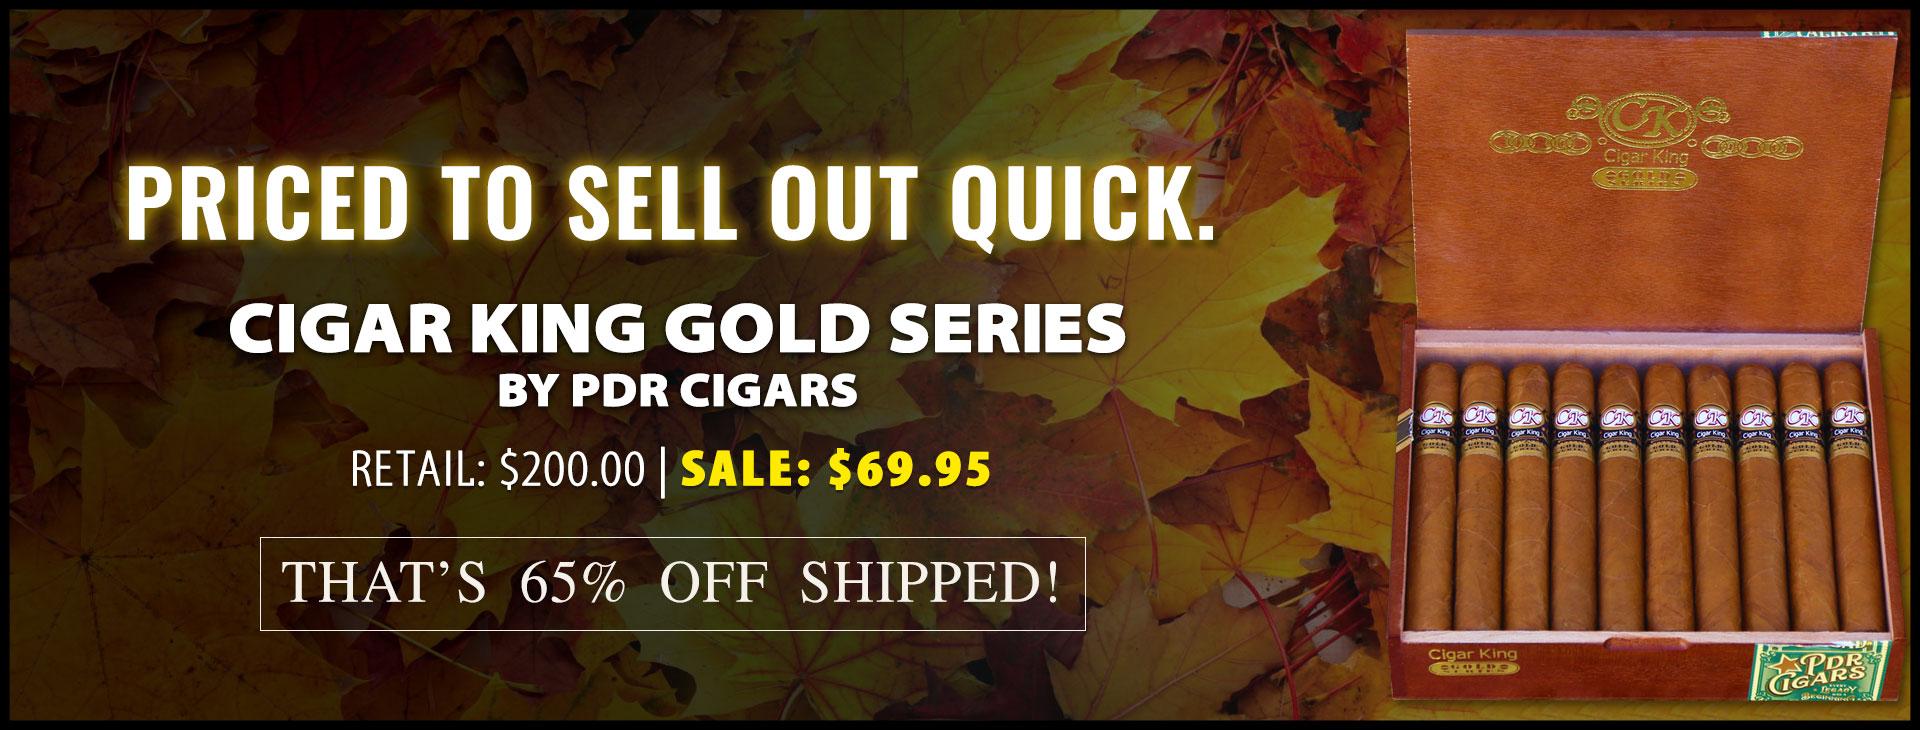 gold-series-cigar-king-2021-banner.jpg